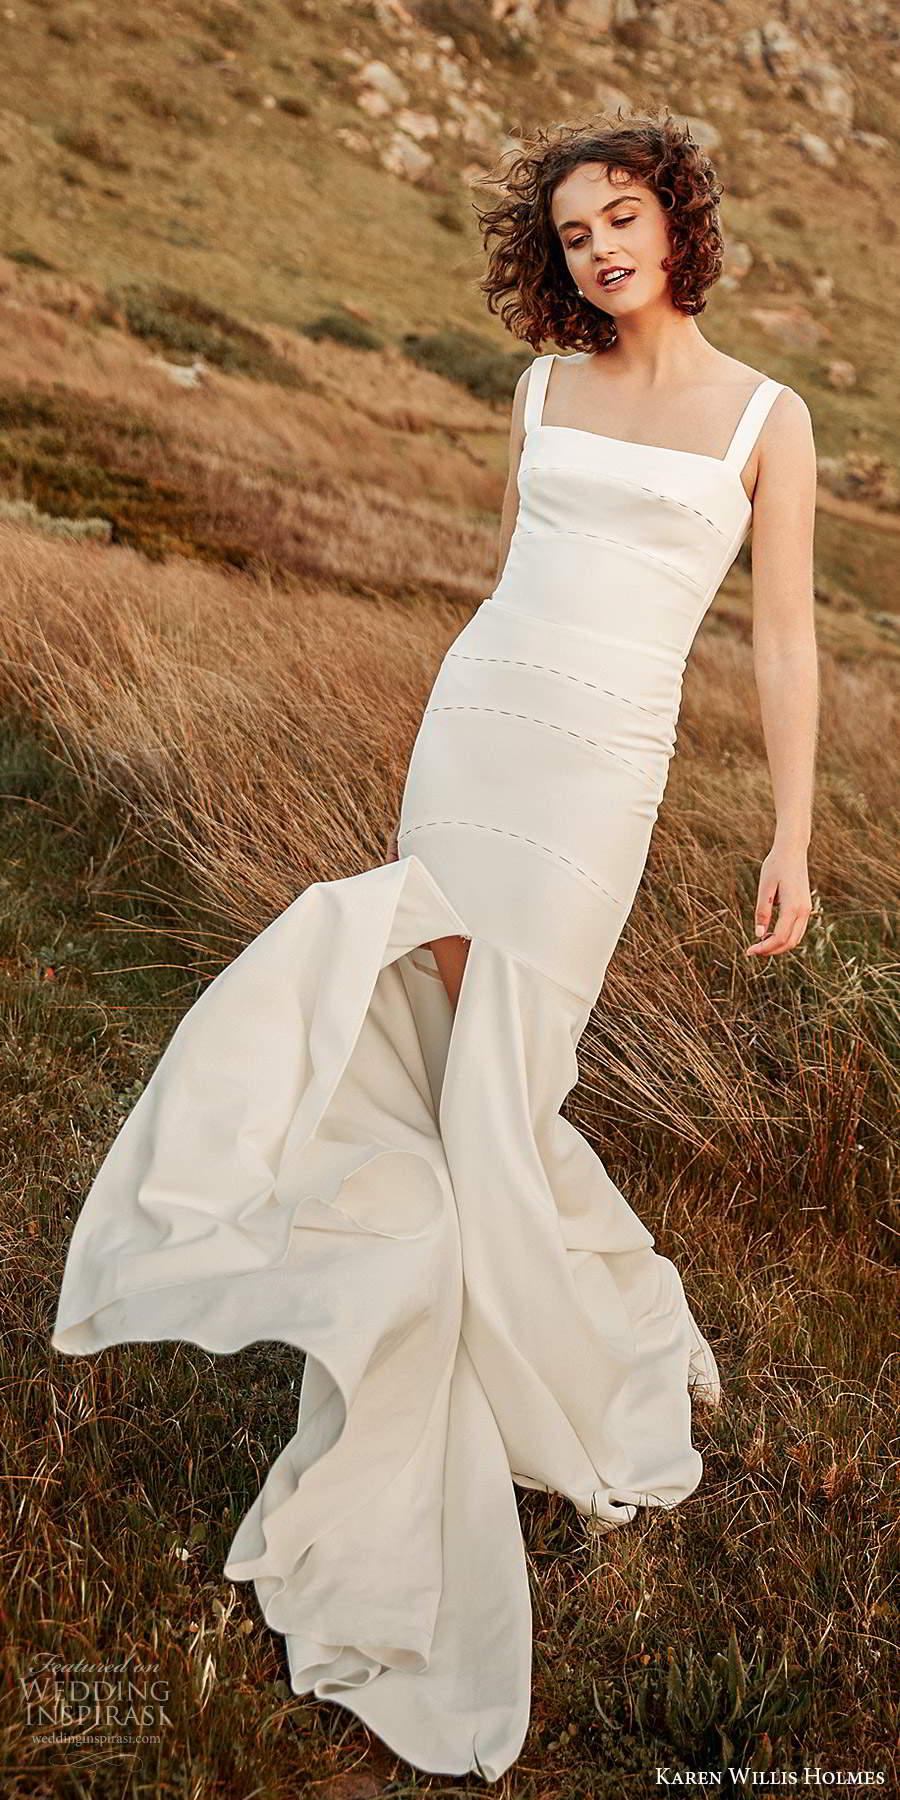 karen willis holmes 2020 bridal sleeveless thick straps straight across neckline clean minimally embellished fit flare mermaid wedding dress slit skirt sweep train (5) mv